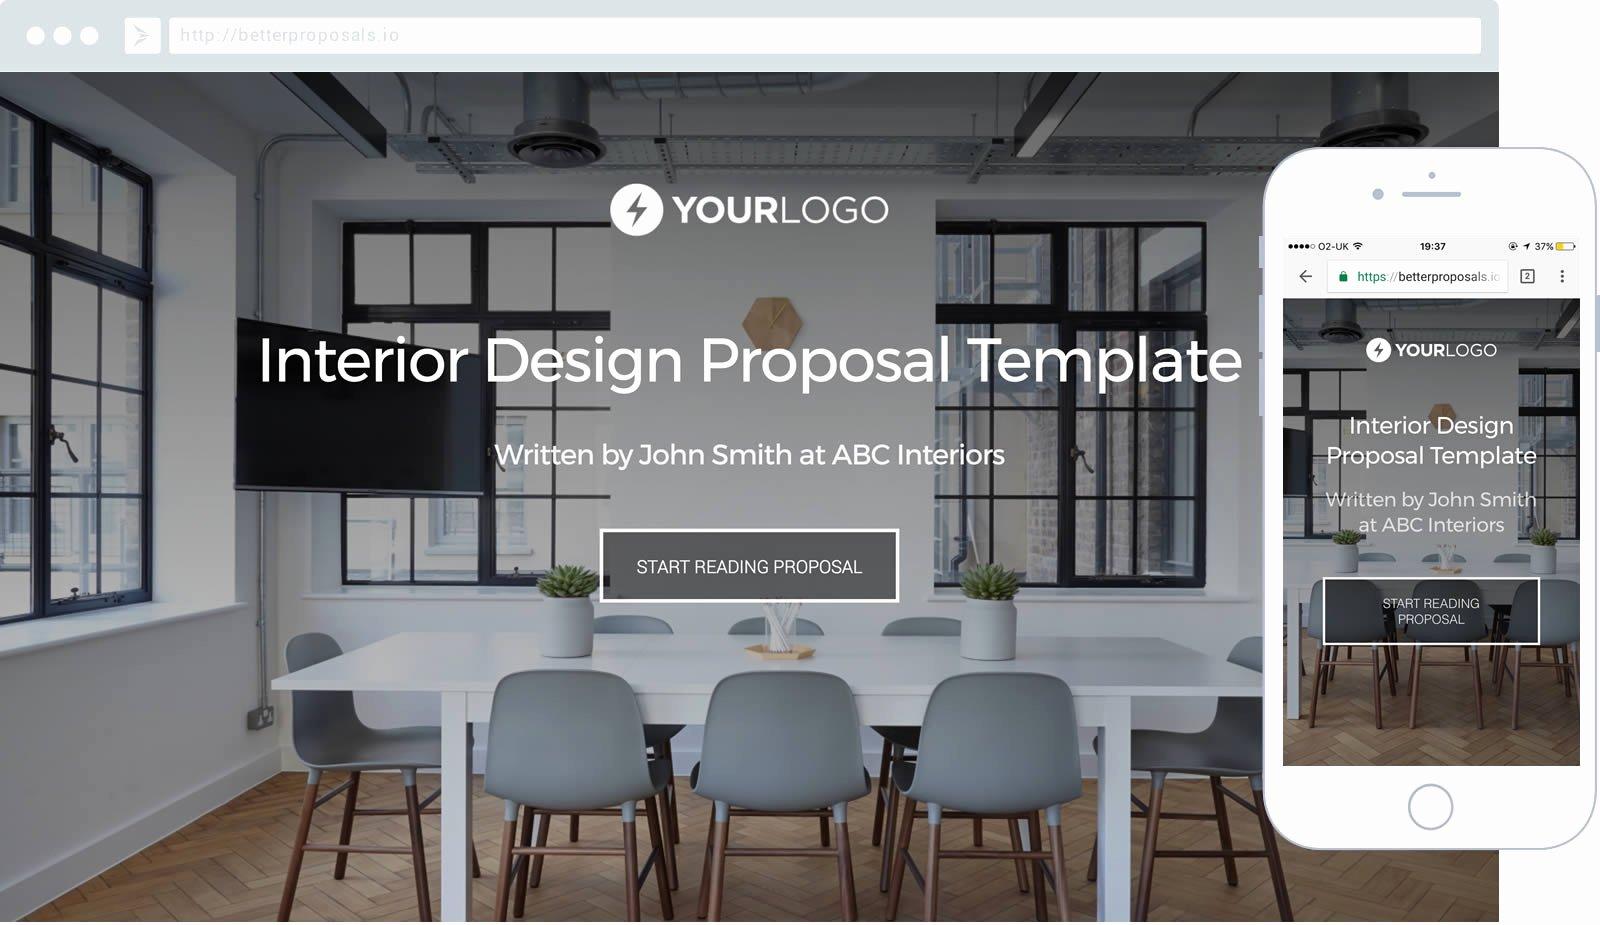 Interior Design Template Free Beautiful Free Interior Design Proposal Template Better Proposals